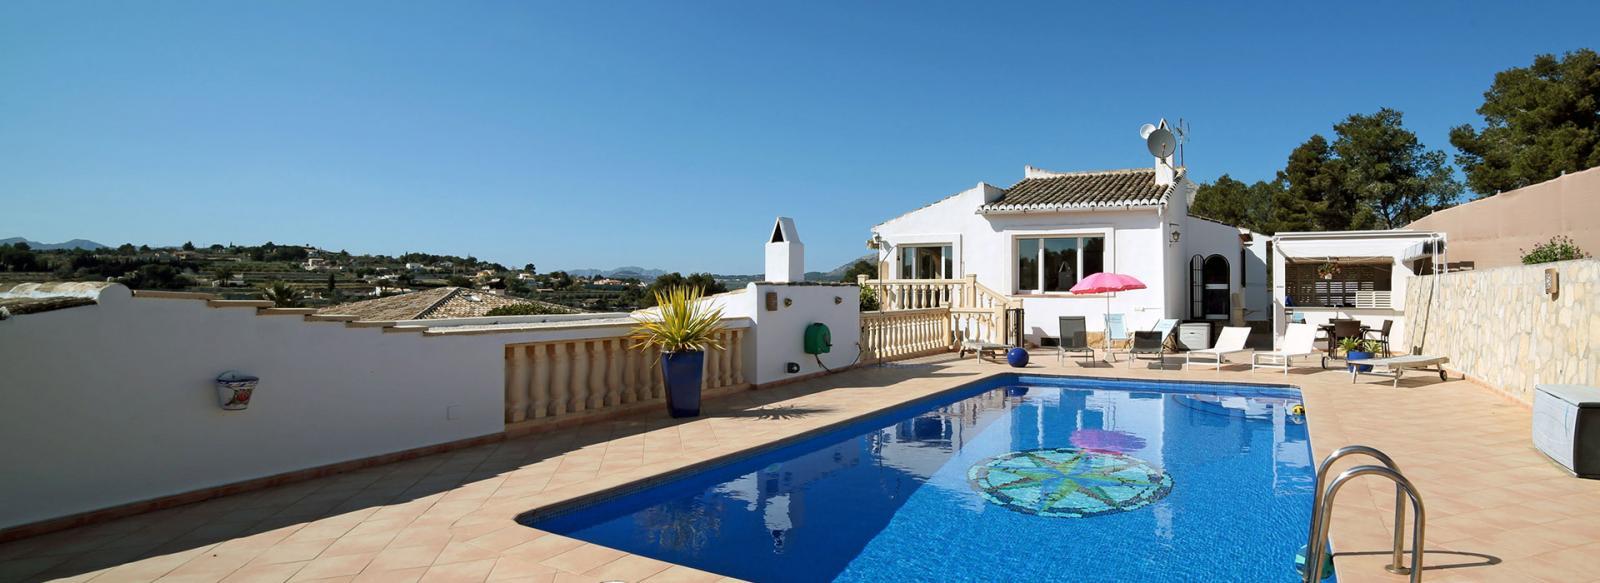 acb.immo - Villa de 8 chambres avec piscine à Javea